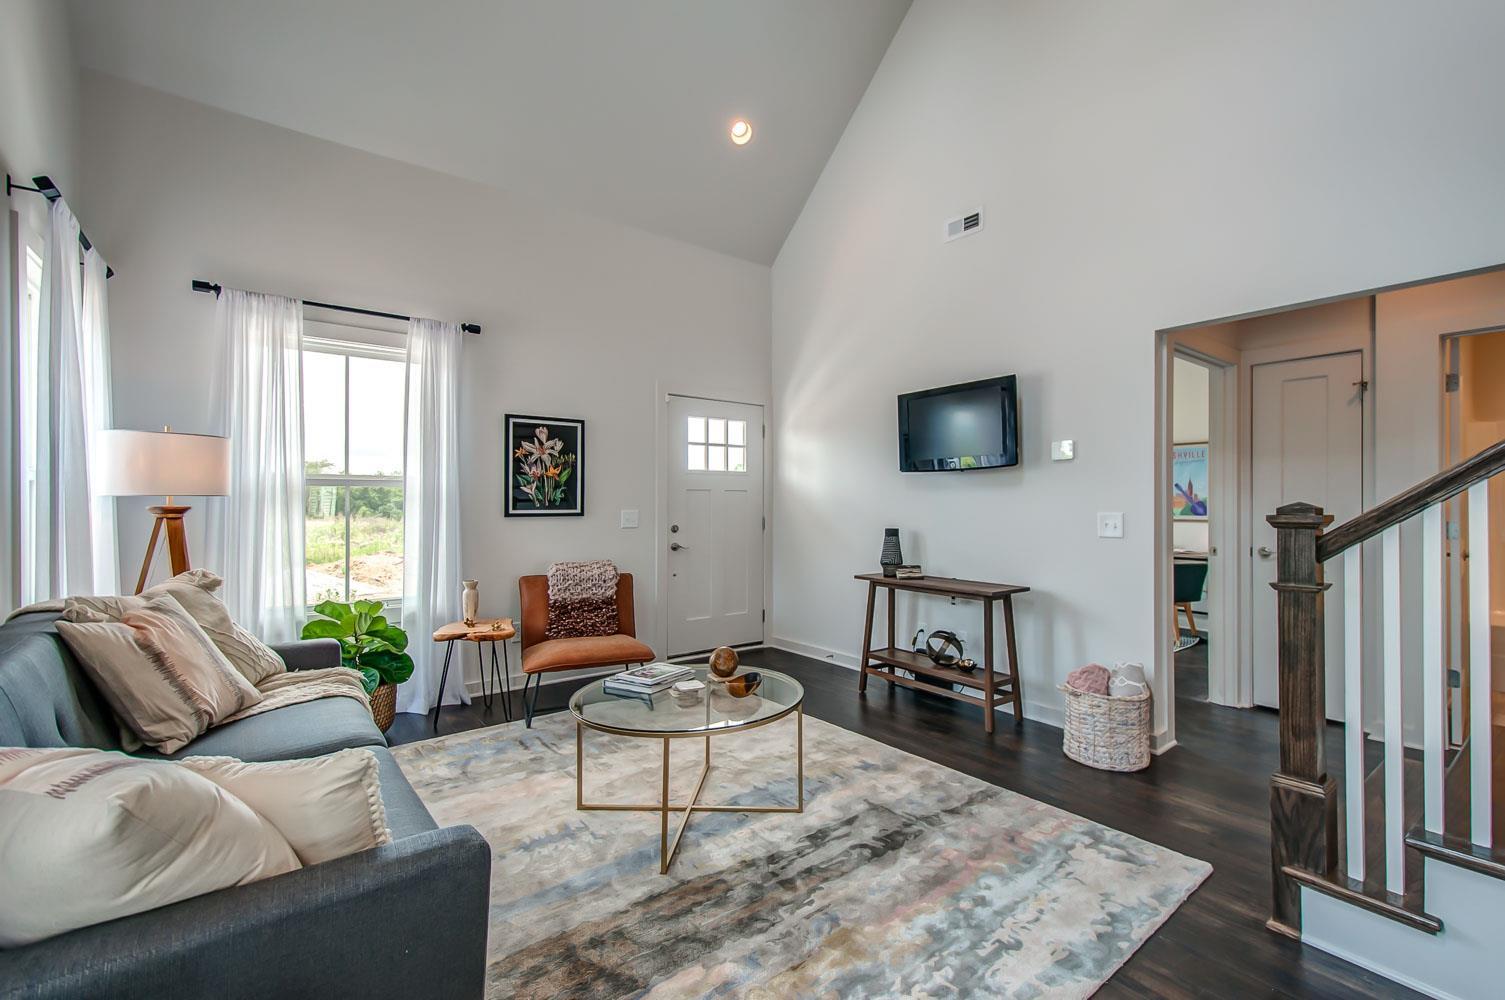 975 Ashland Place Dr, Nashville, TN 37218 - Nashville, TN real estate listing